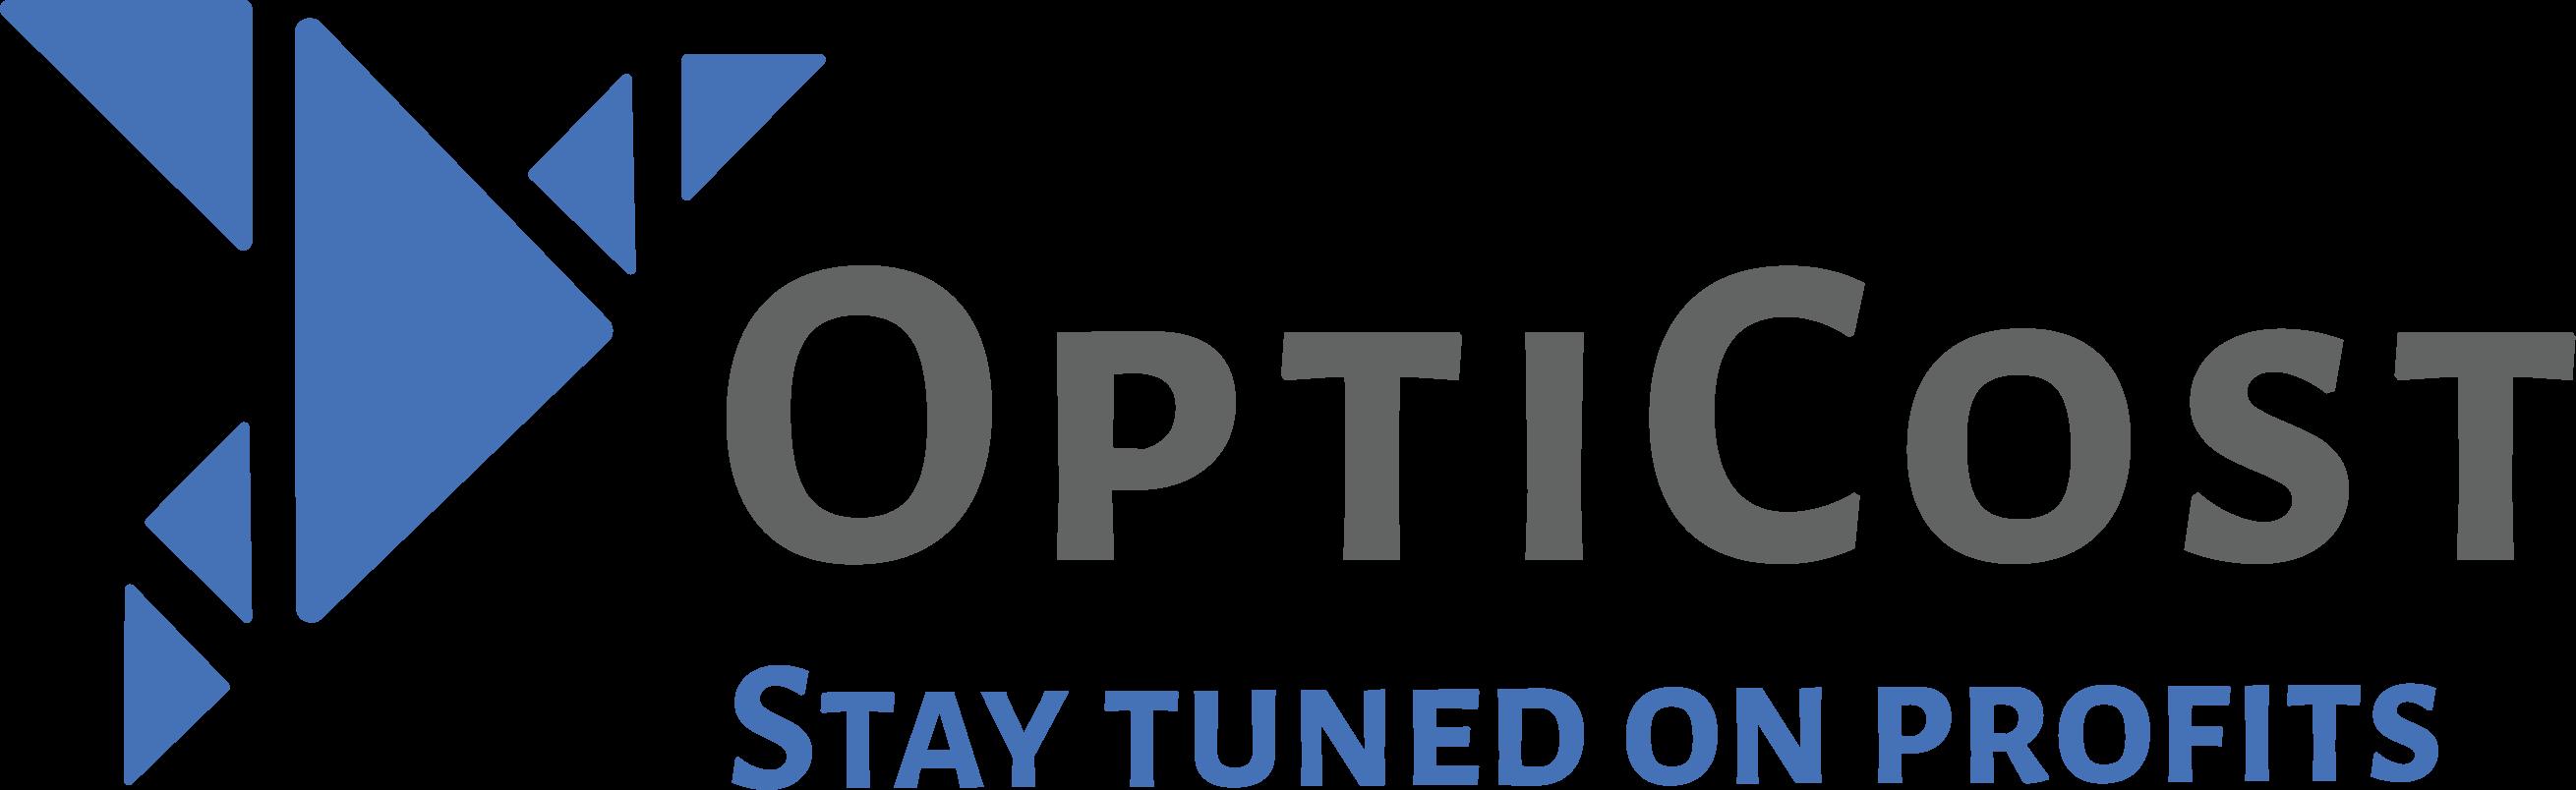 Opticost logo